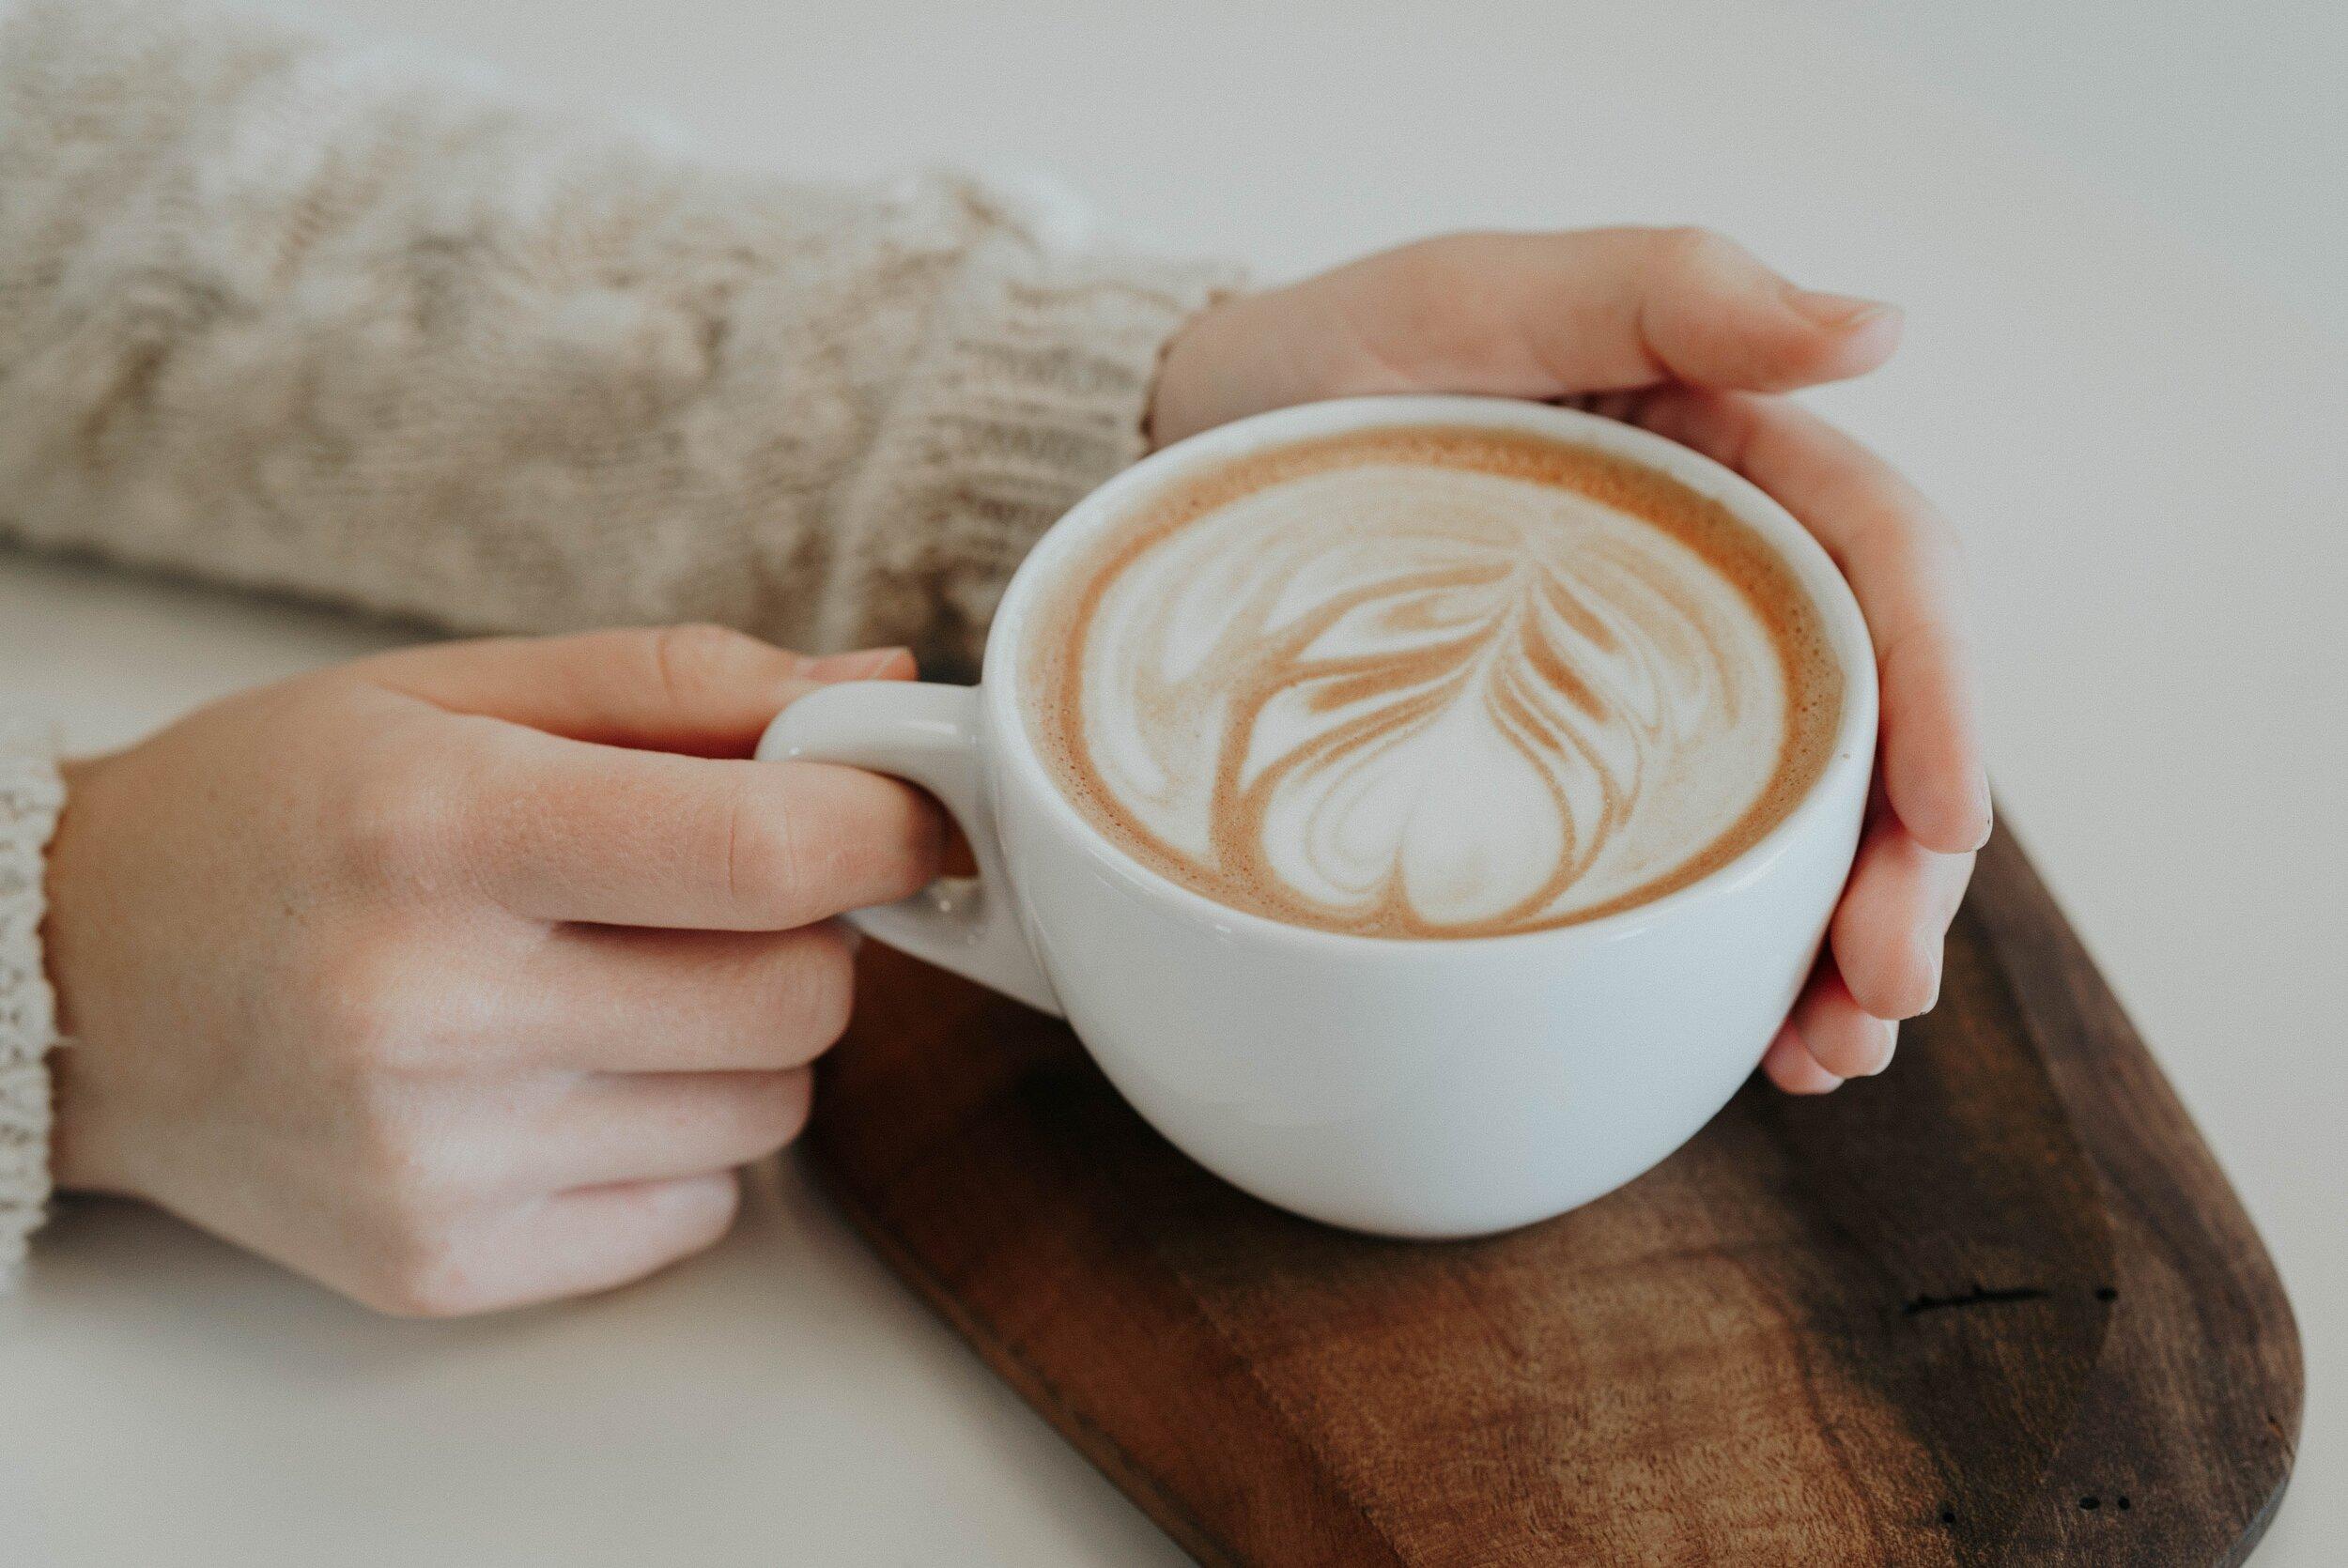 Krank Koffie Co.